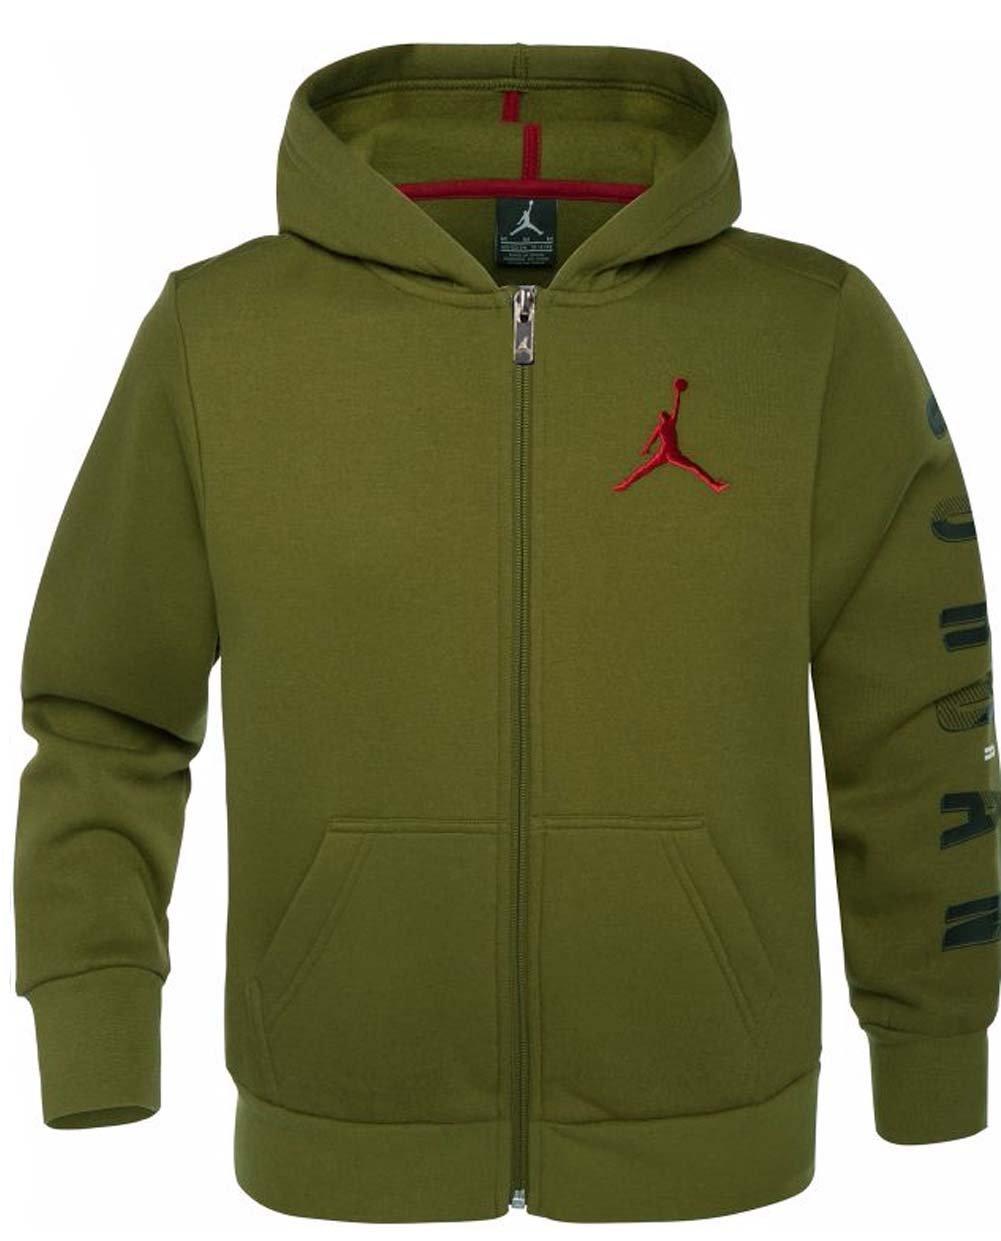 Jordan Nike Air Boys' Jumpman Graphic Full-Zip Jacket (Military Green, Small)